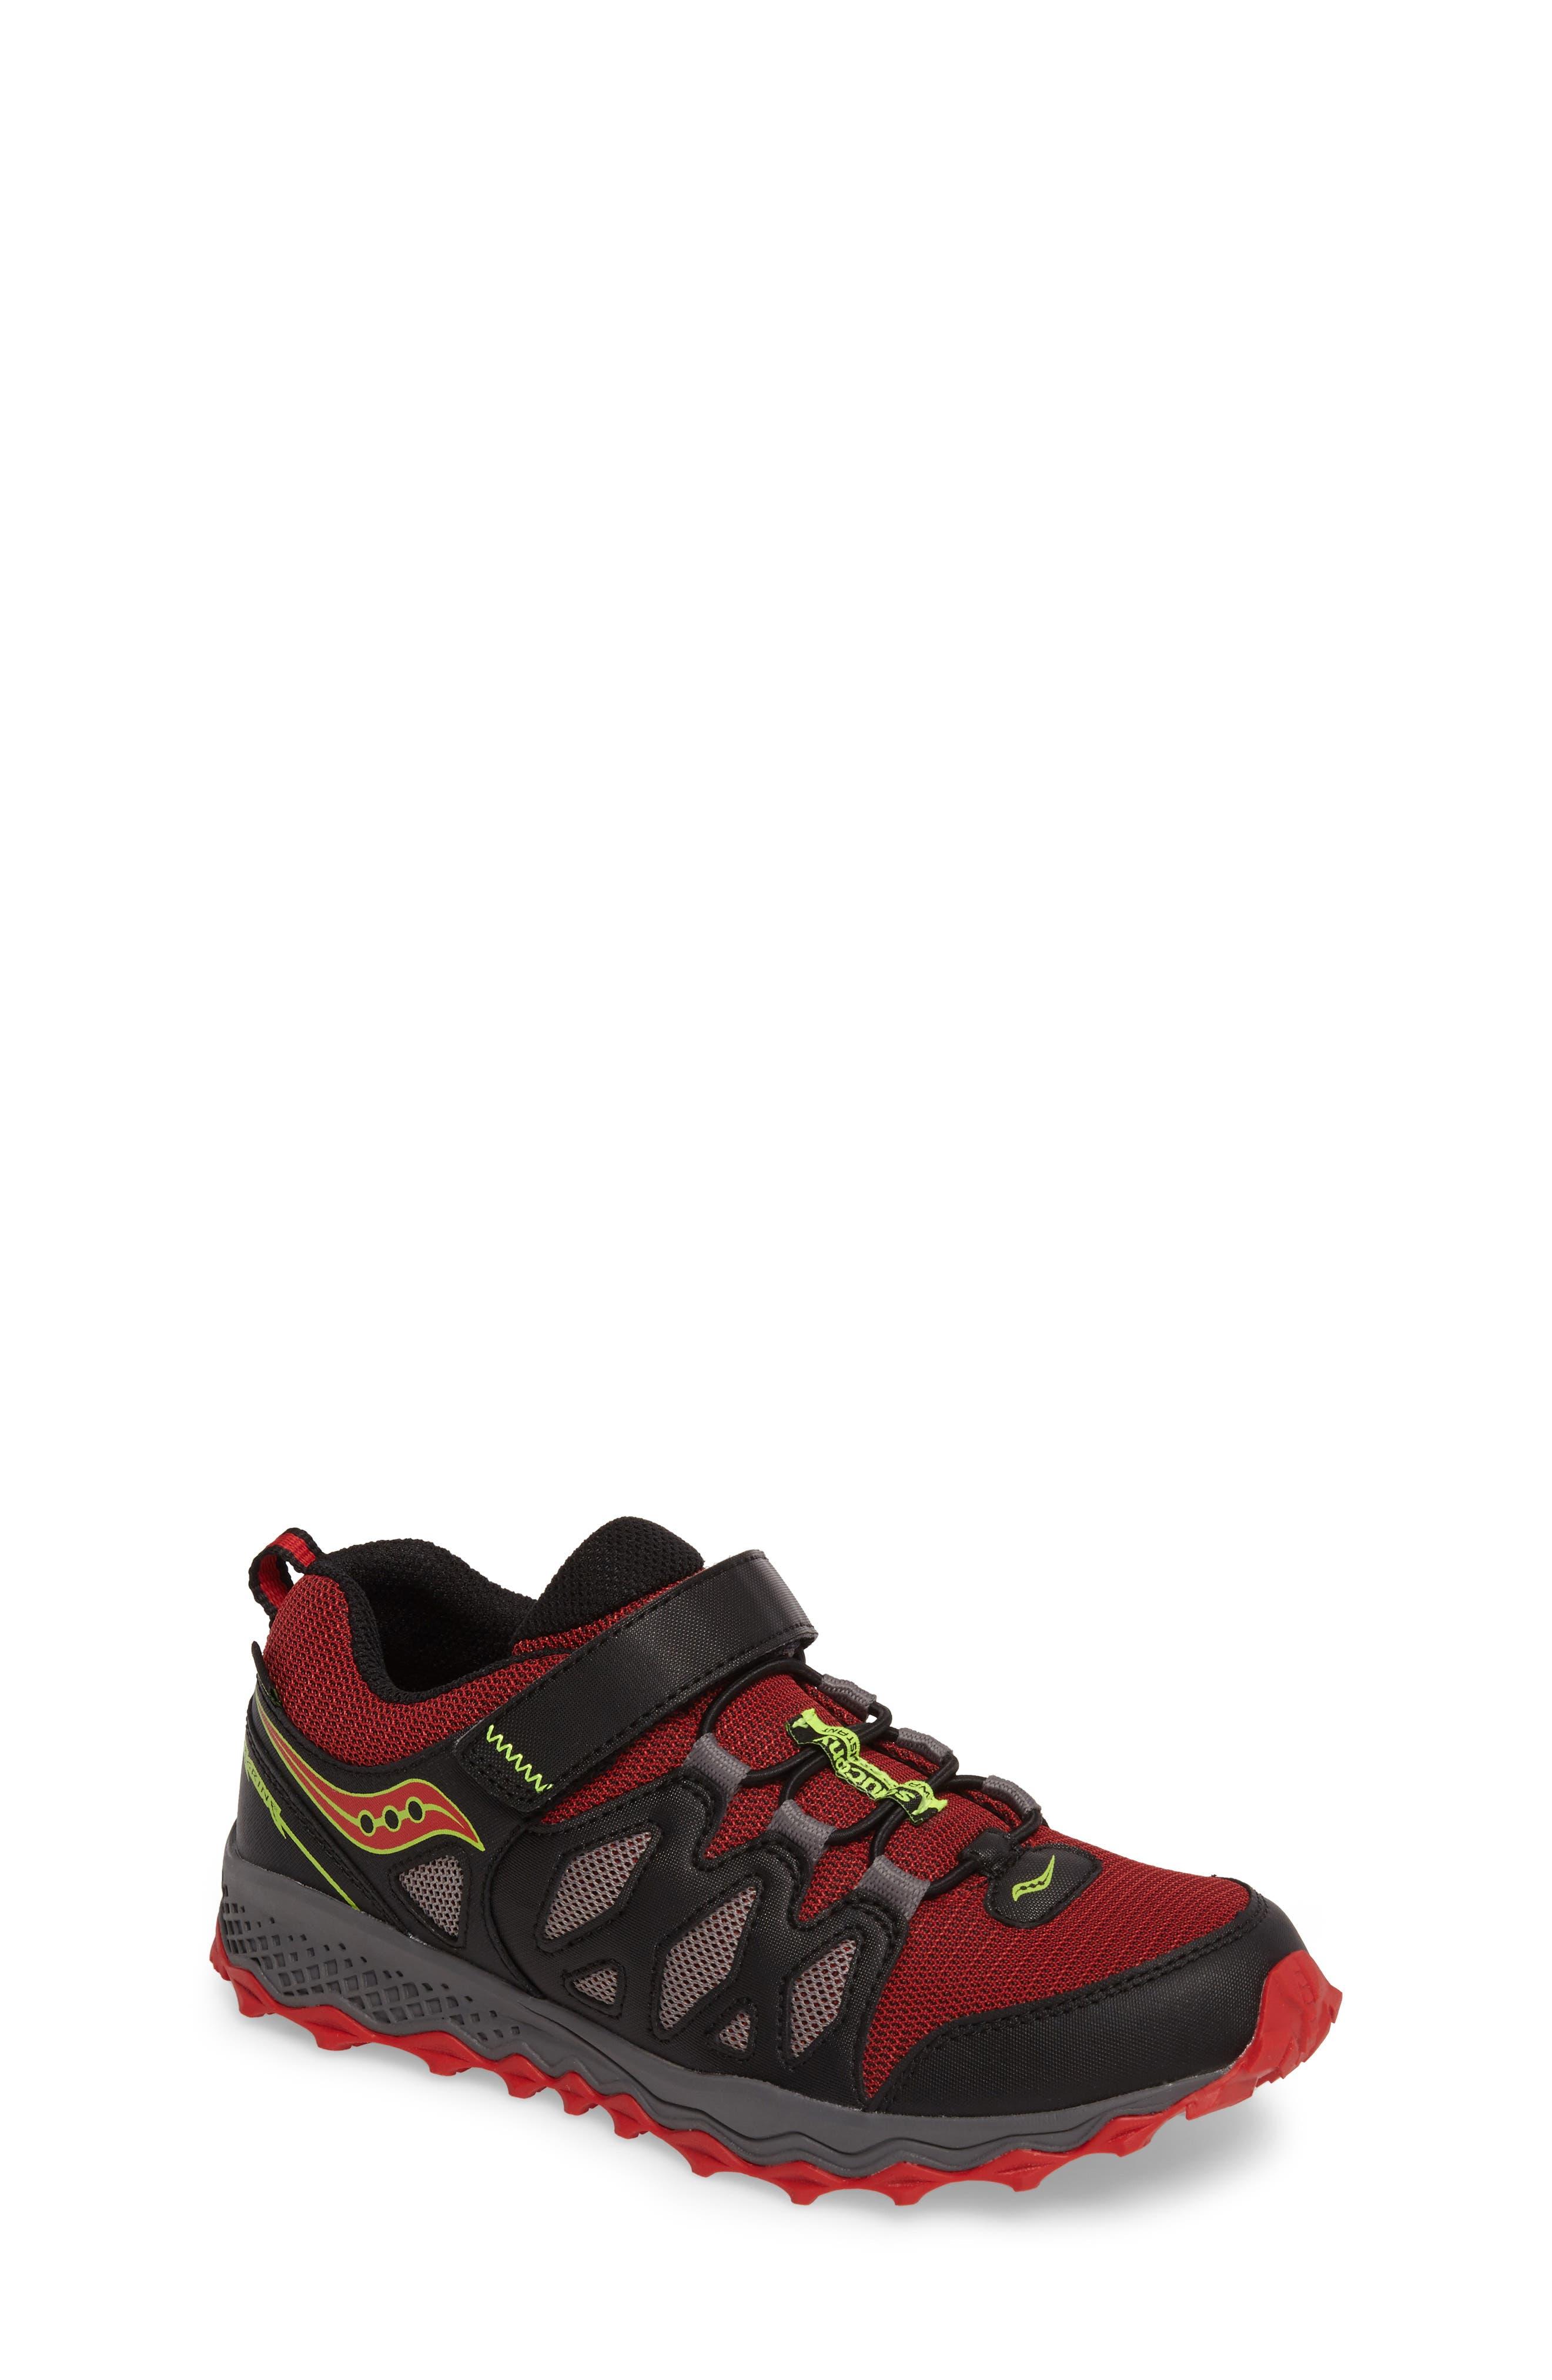 Peregrine Shield Water-Resistant Sneaker,                         Main,                         color,